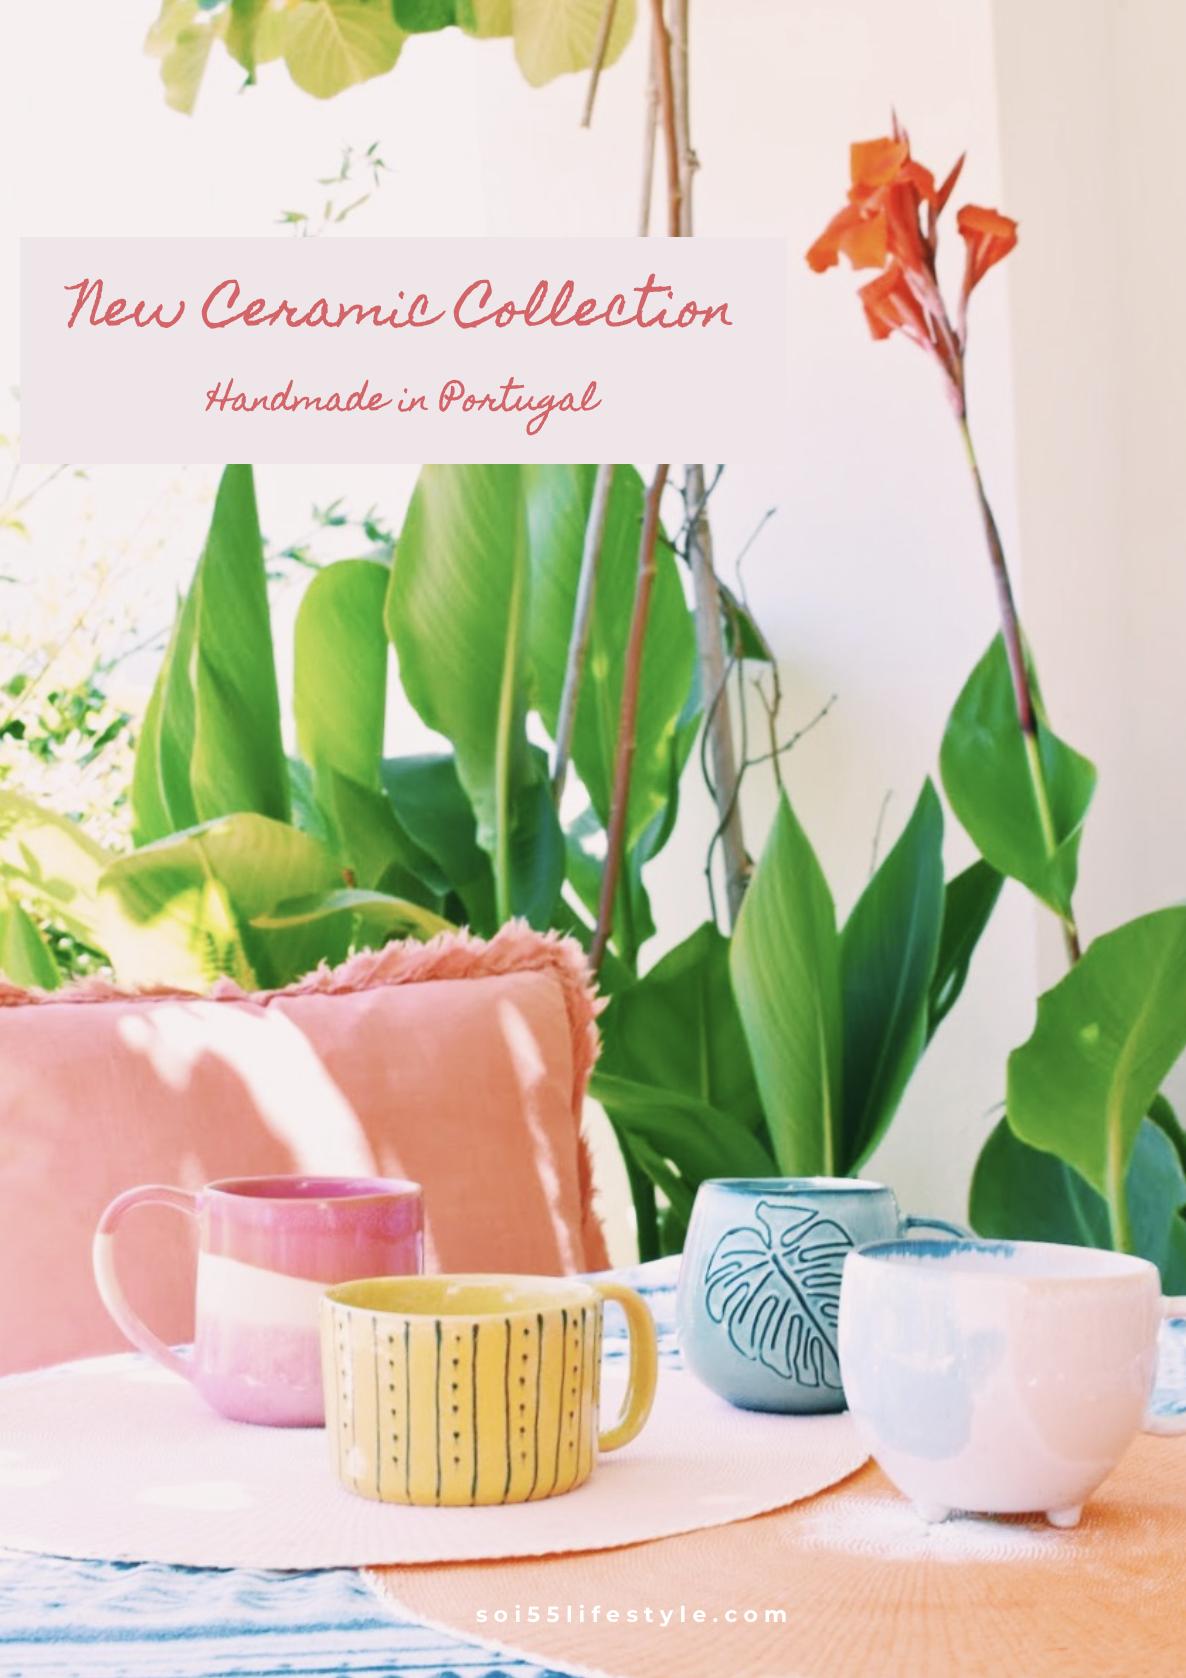 Portuguese Ceramic Mug Collection | Soi 55 Home